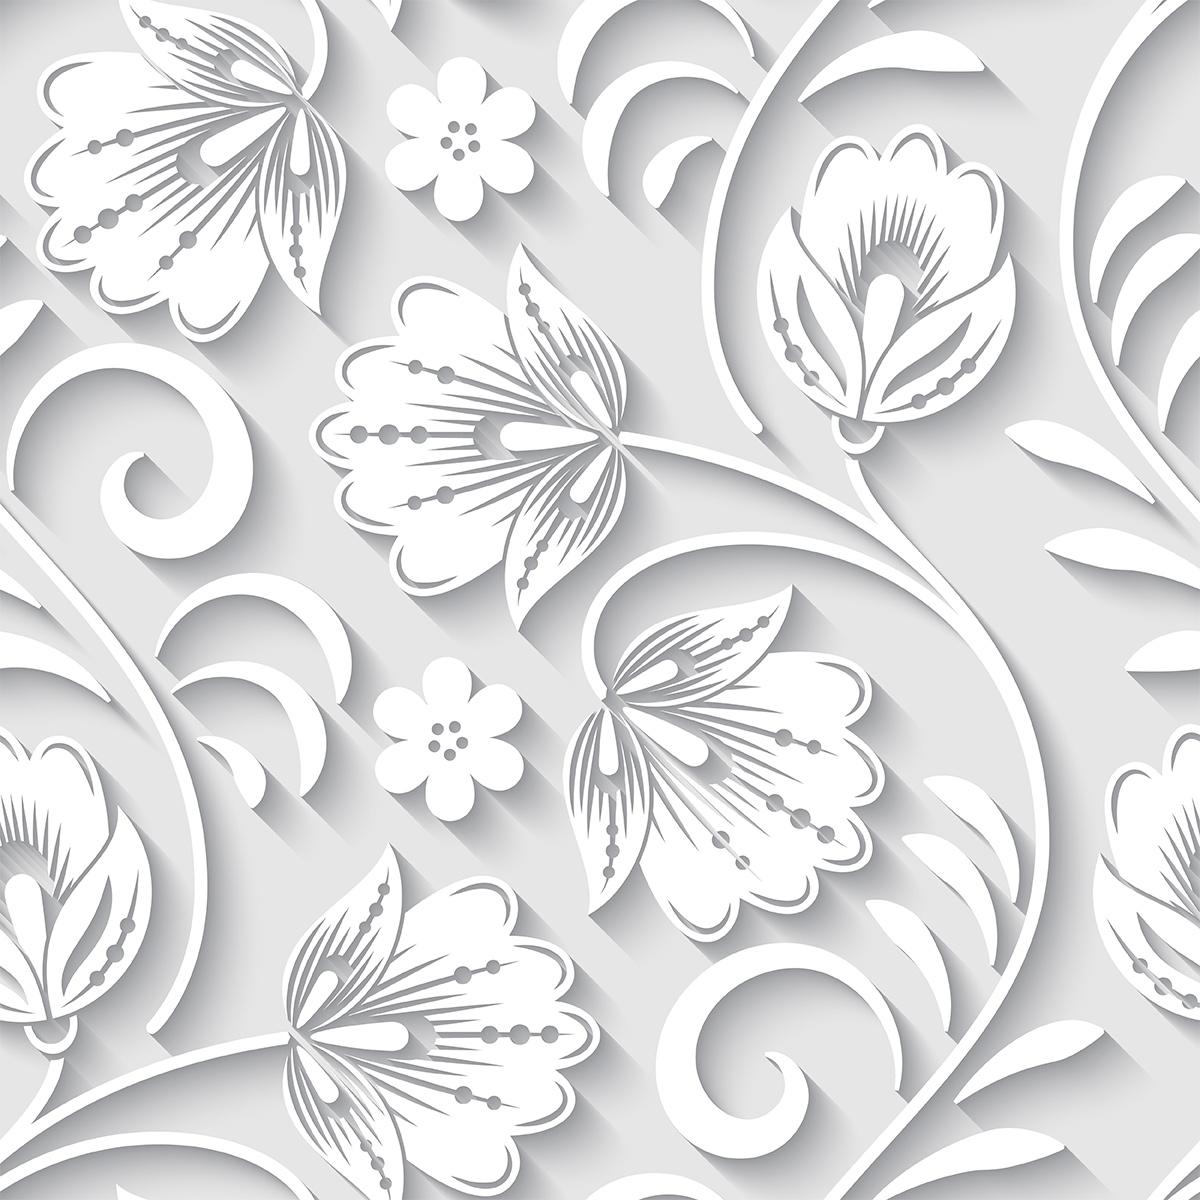 Papel de Parede 3D Galhos Folhas Floral Adesivo